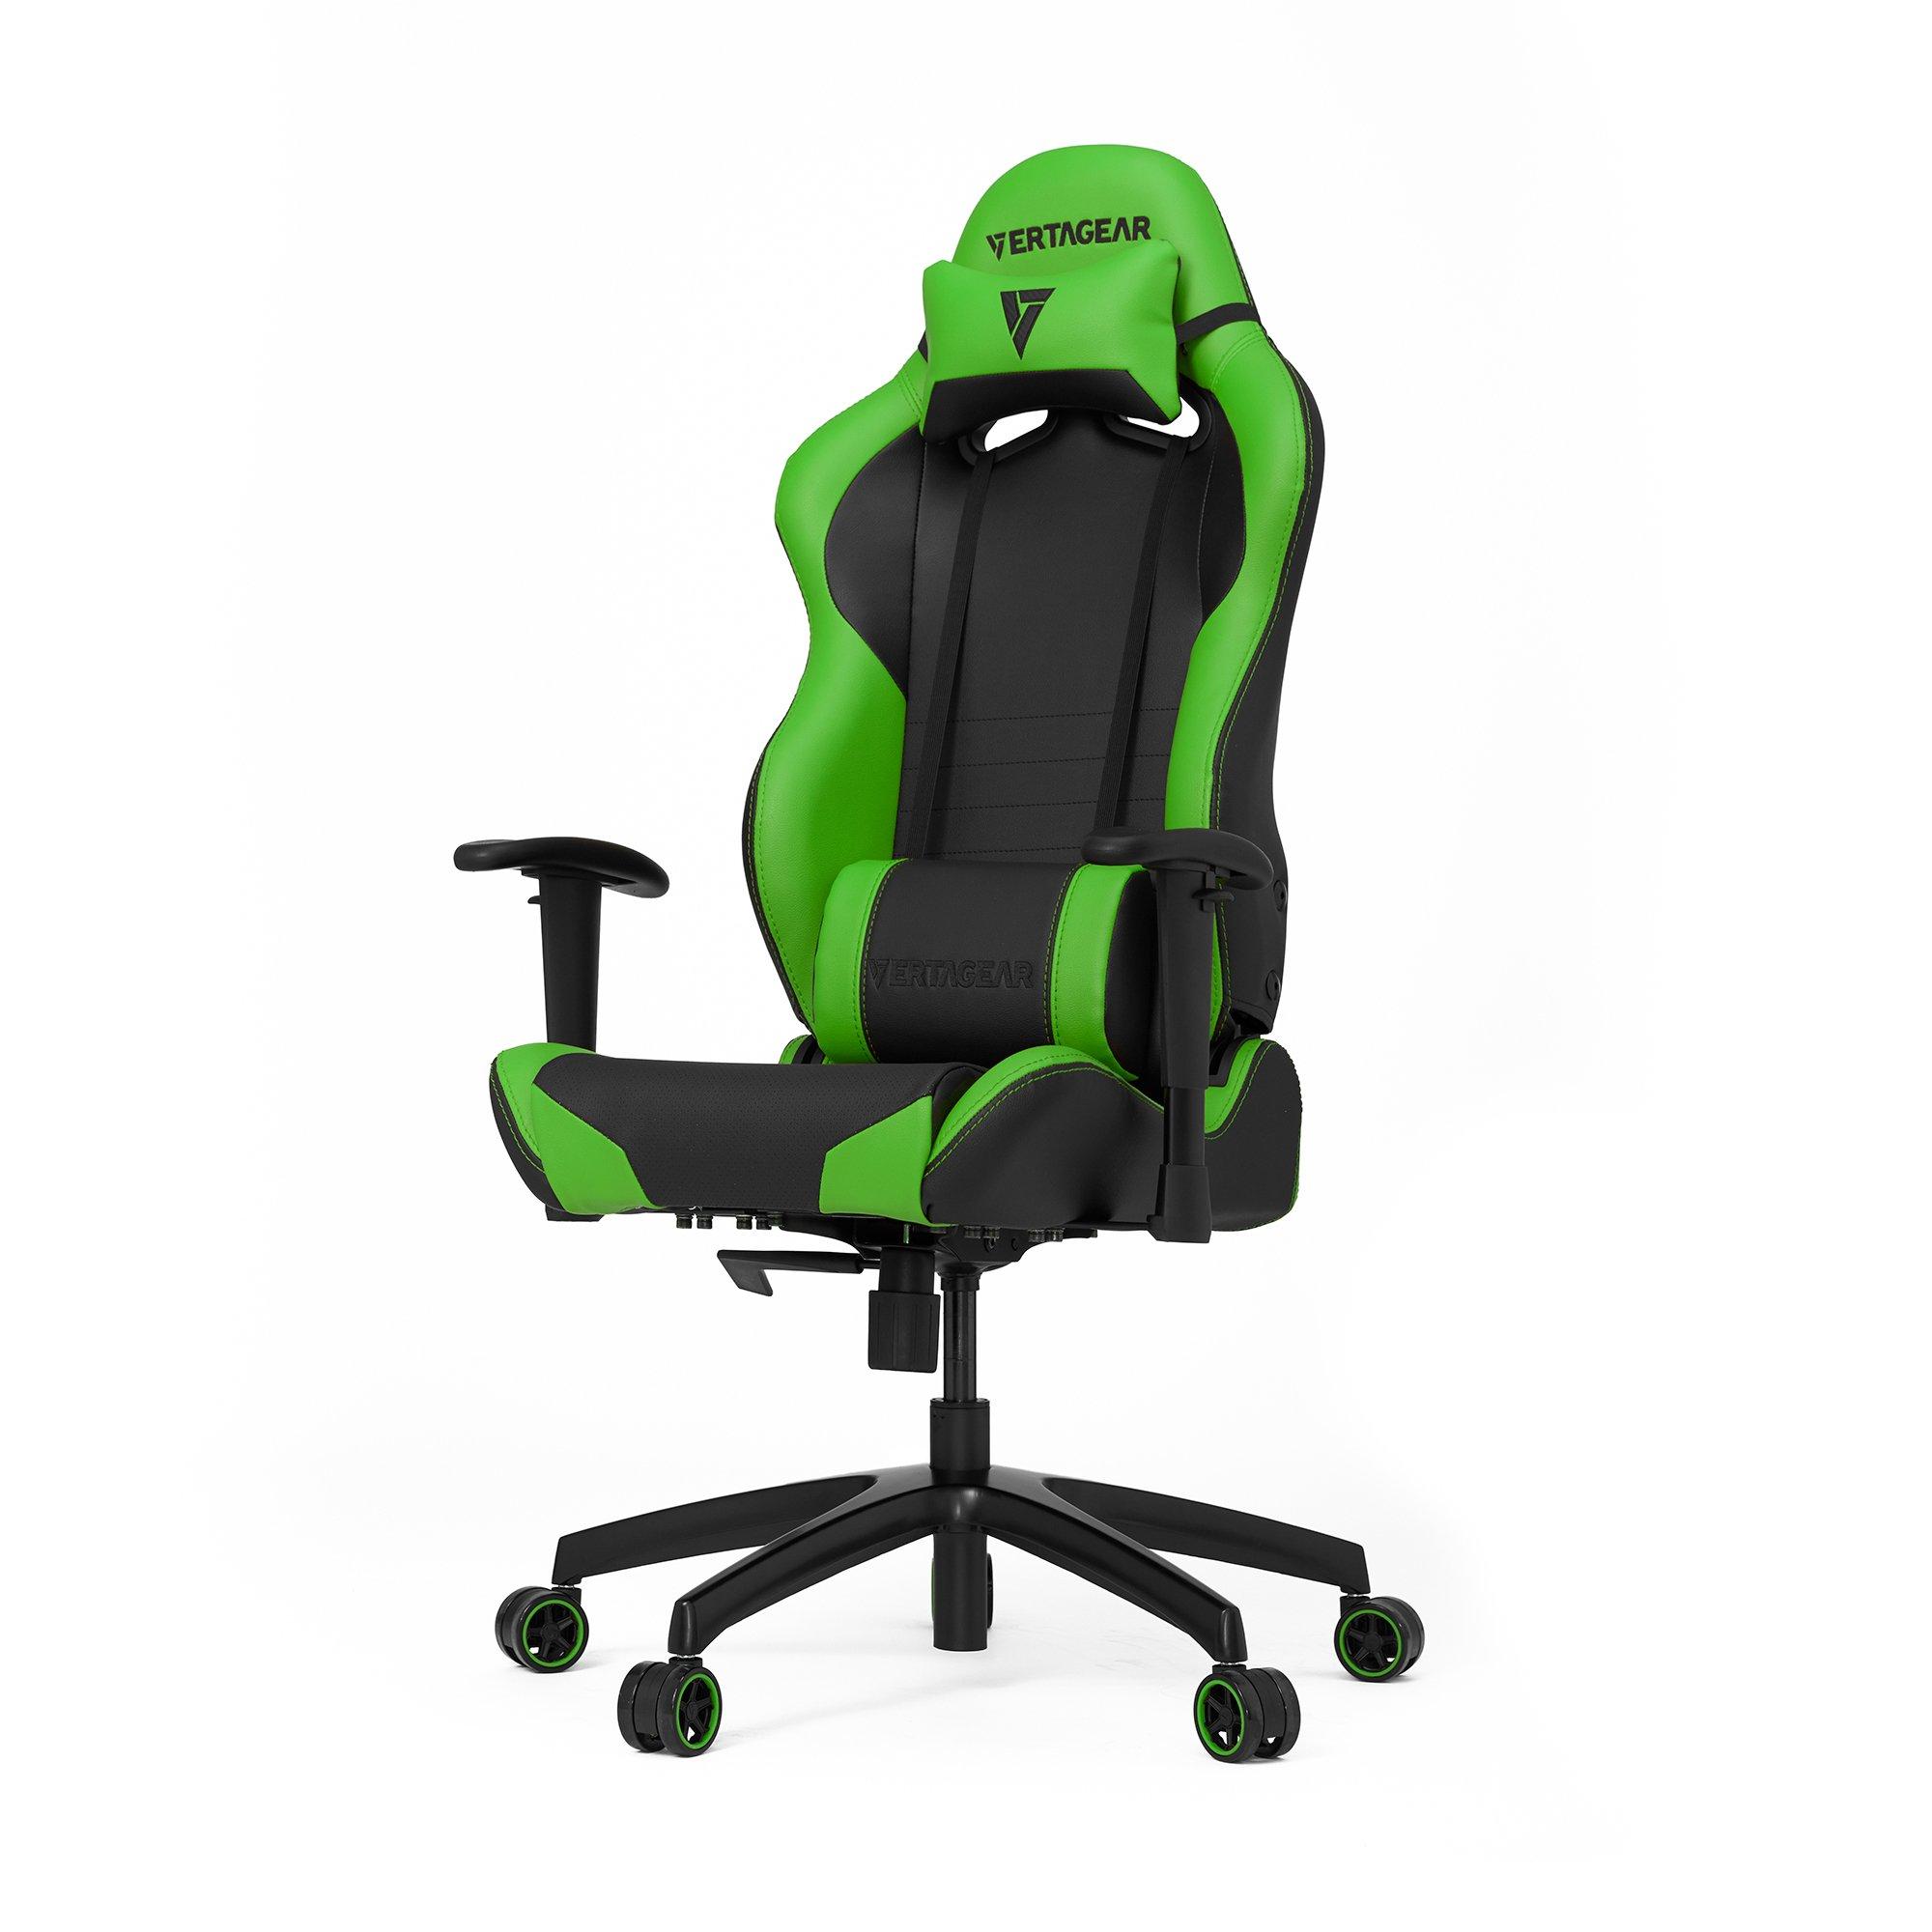 VERTAGEAR S-Line SL2000 Gaming Chair Black/Green Edition by VERTAGEAR